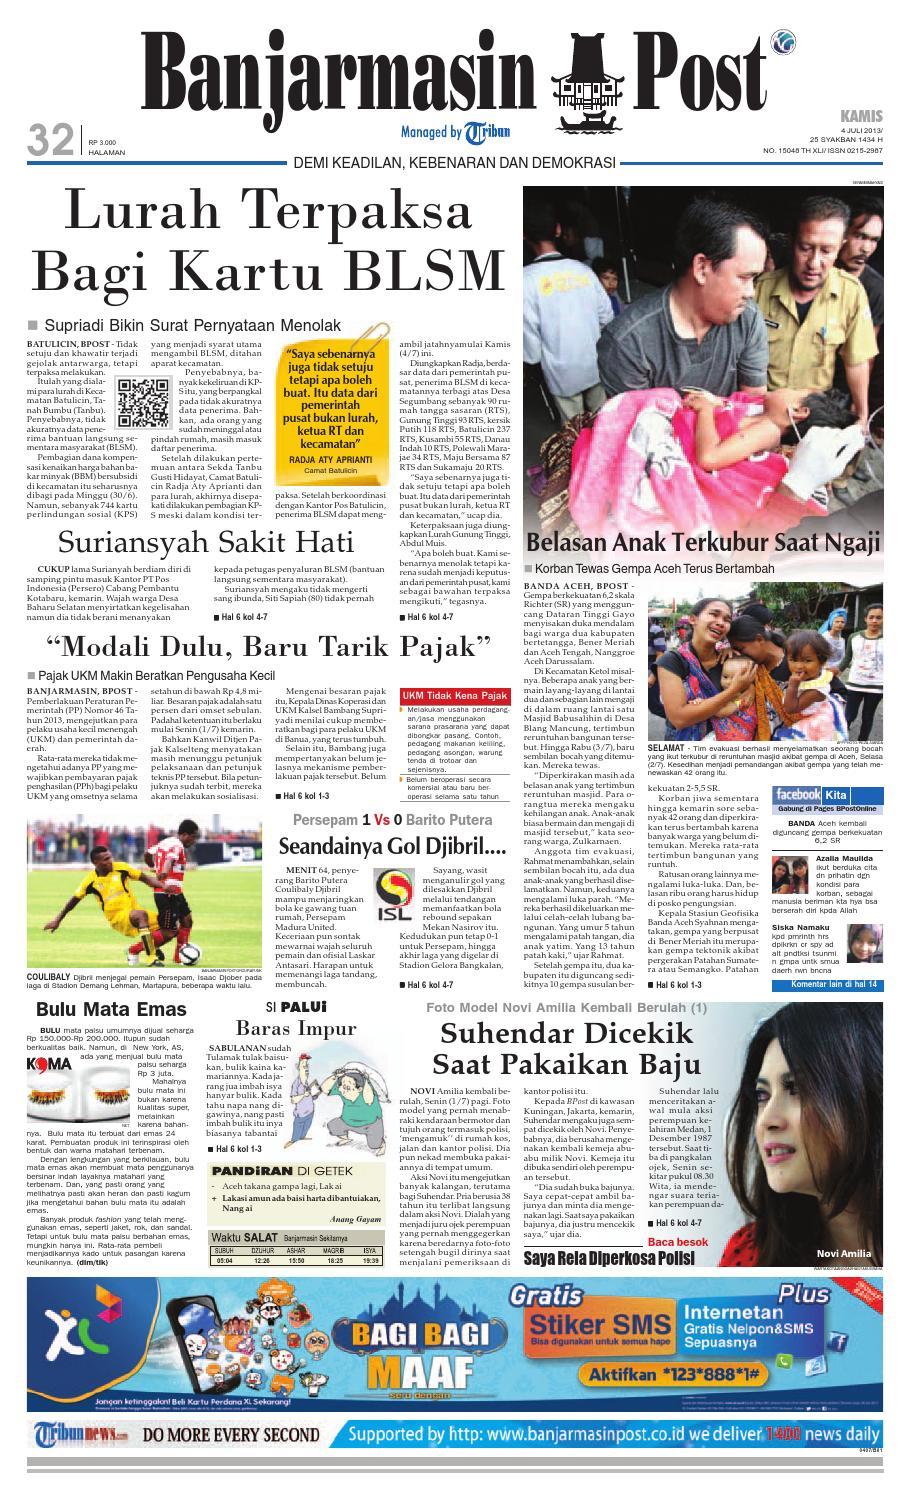 Banjarmasin Post Edisi Kamis 4 Juli 2013 By Issuu Fcenter Lemari Pakaian Wd Hk 1802 Sh Jawa Tengah